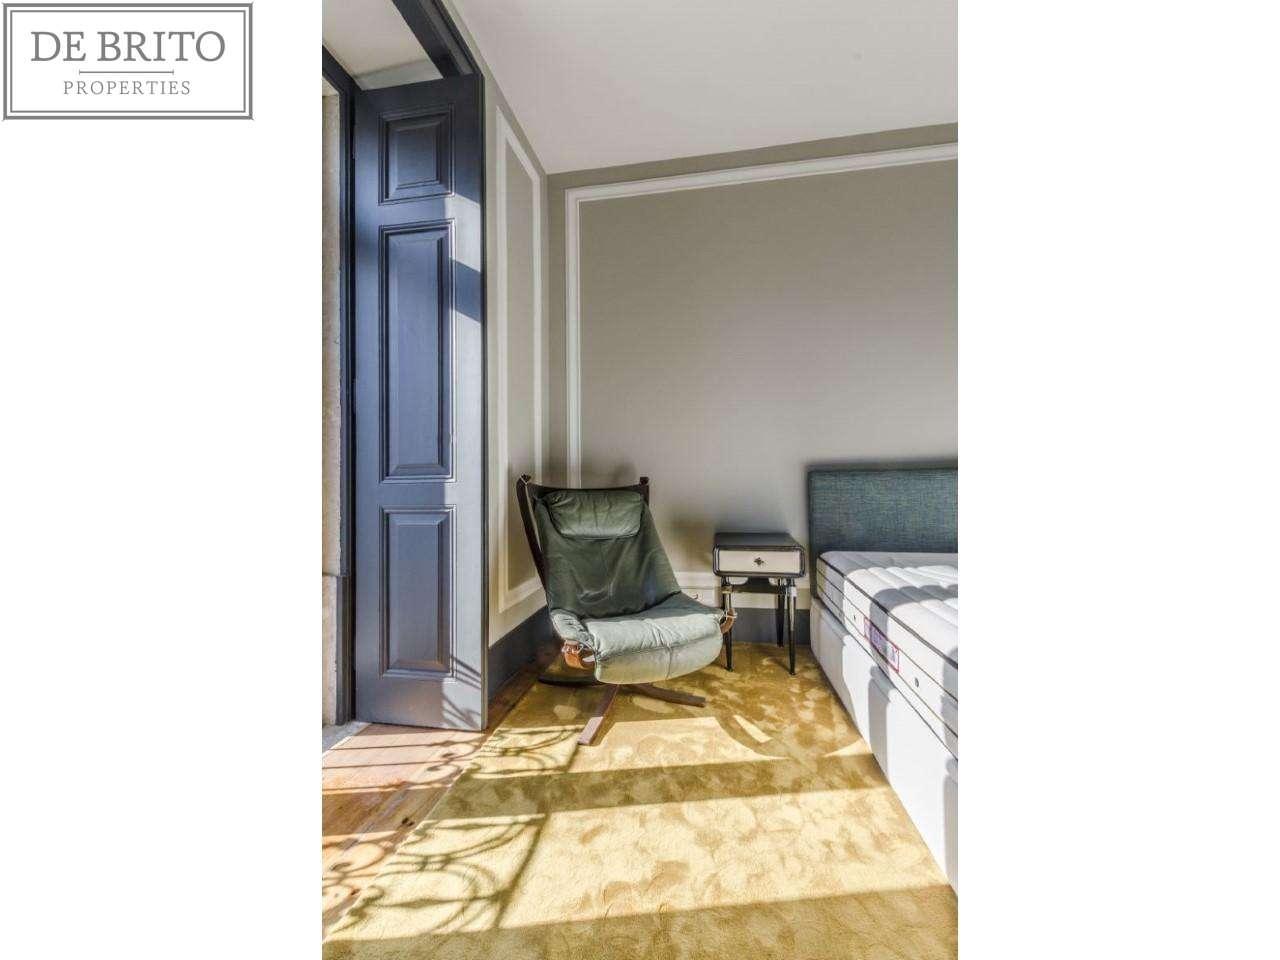 Apartamento para comprar, Misericórdia, Lisboa - Foto 16